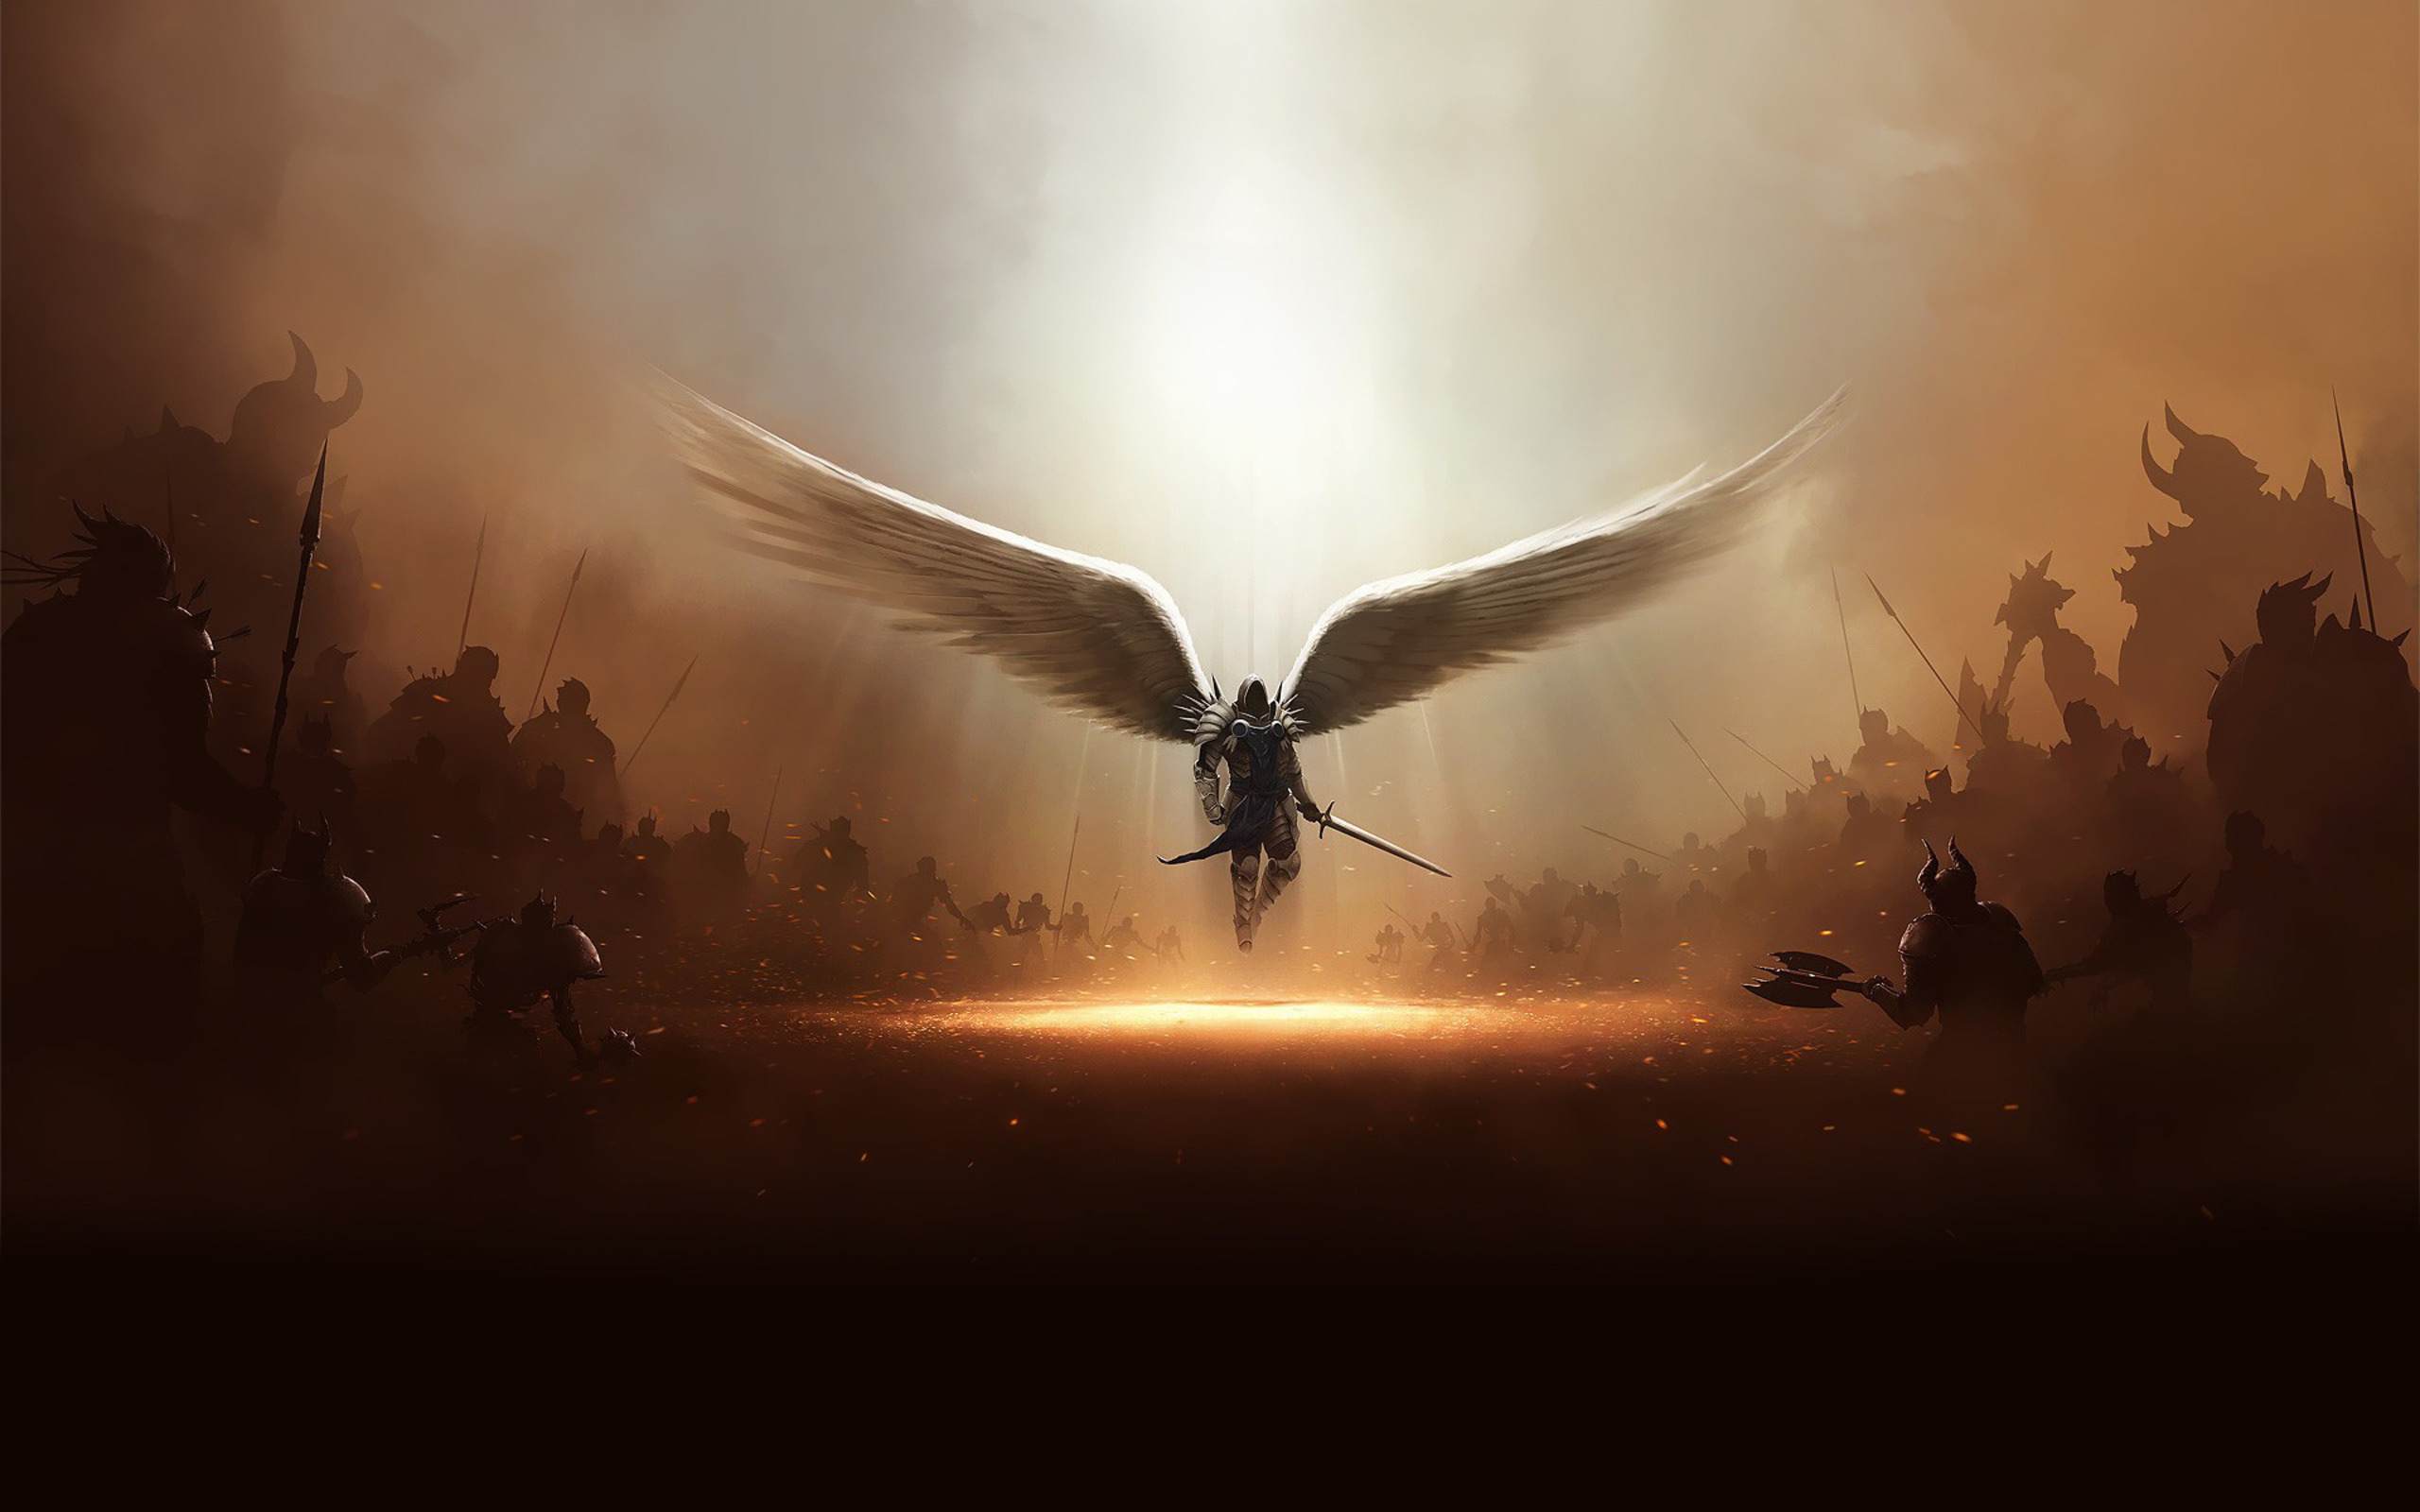 Archangel Art Draw